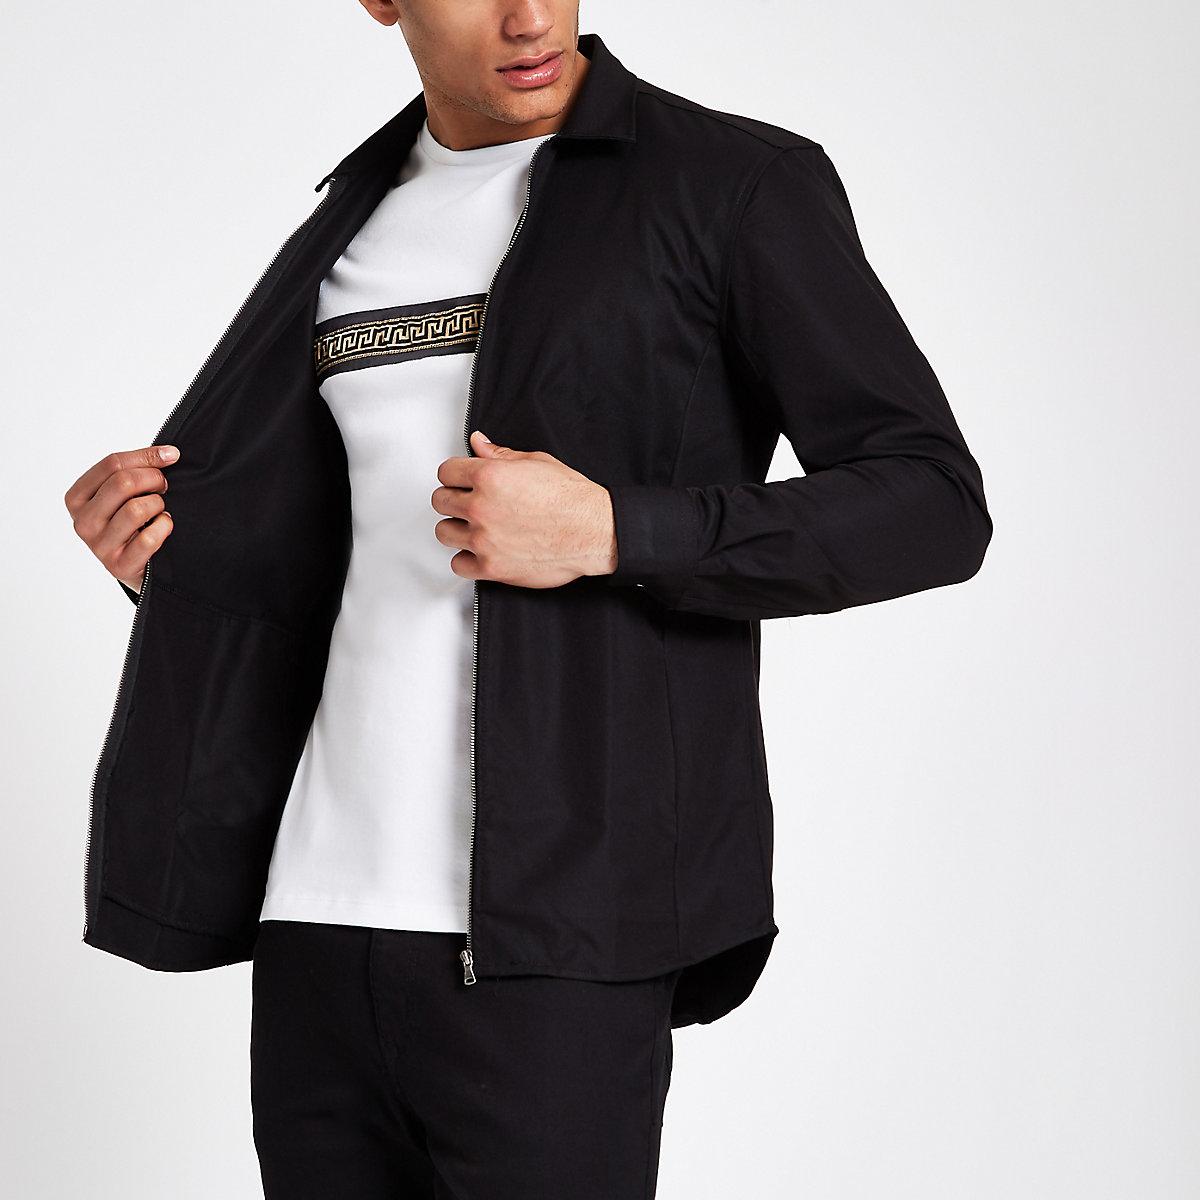 Minimum black light weight jacket